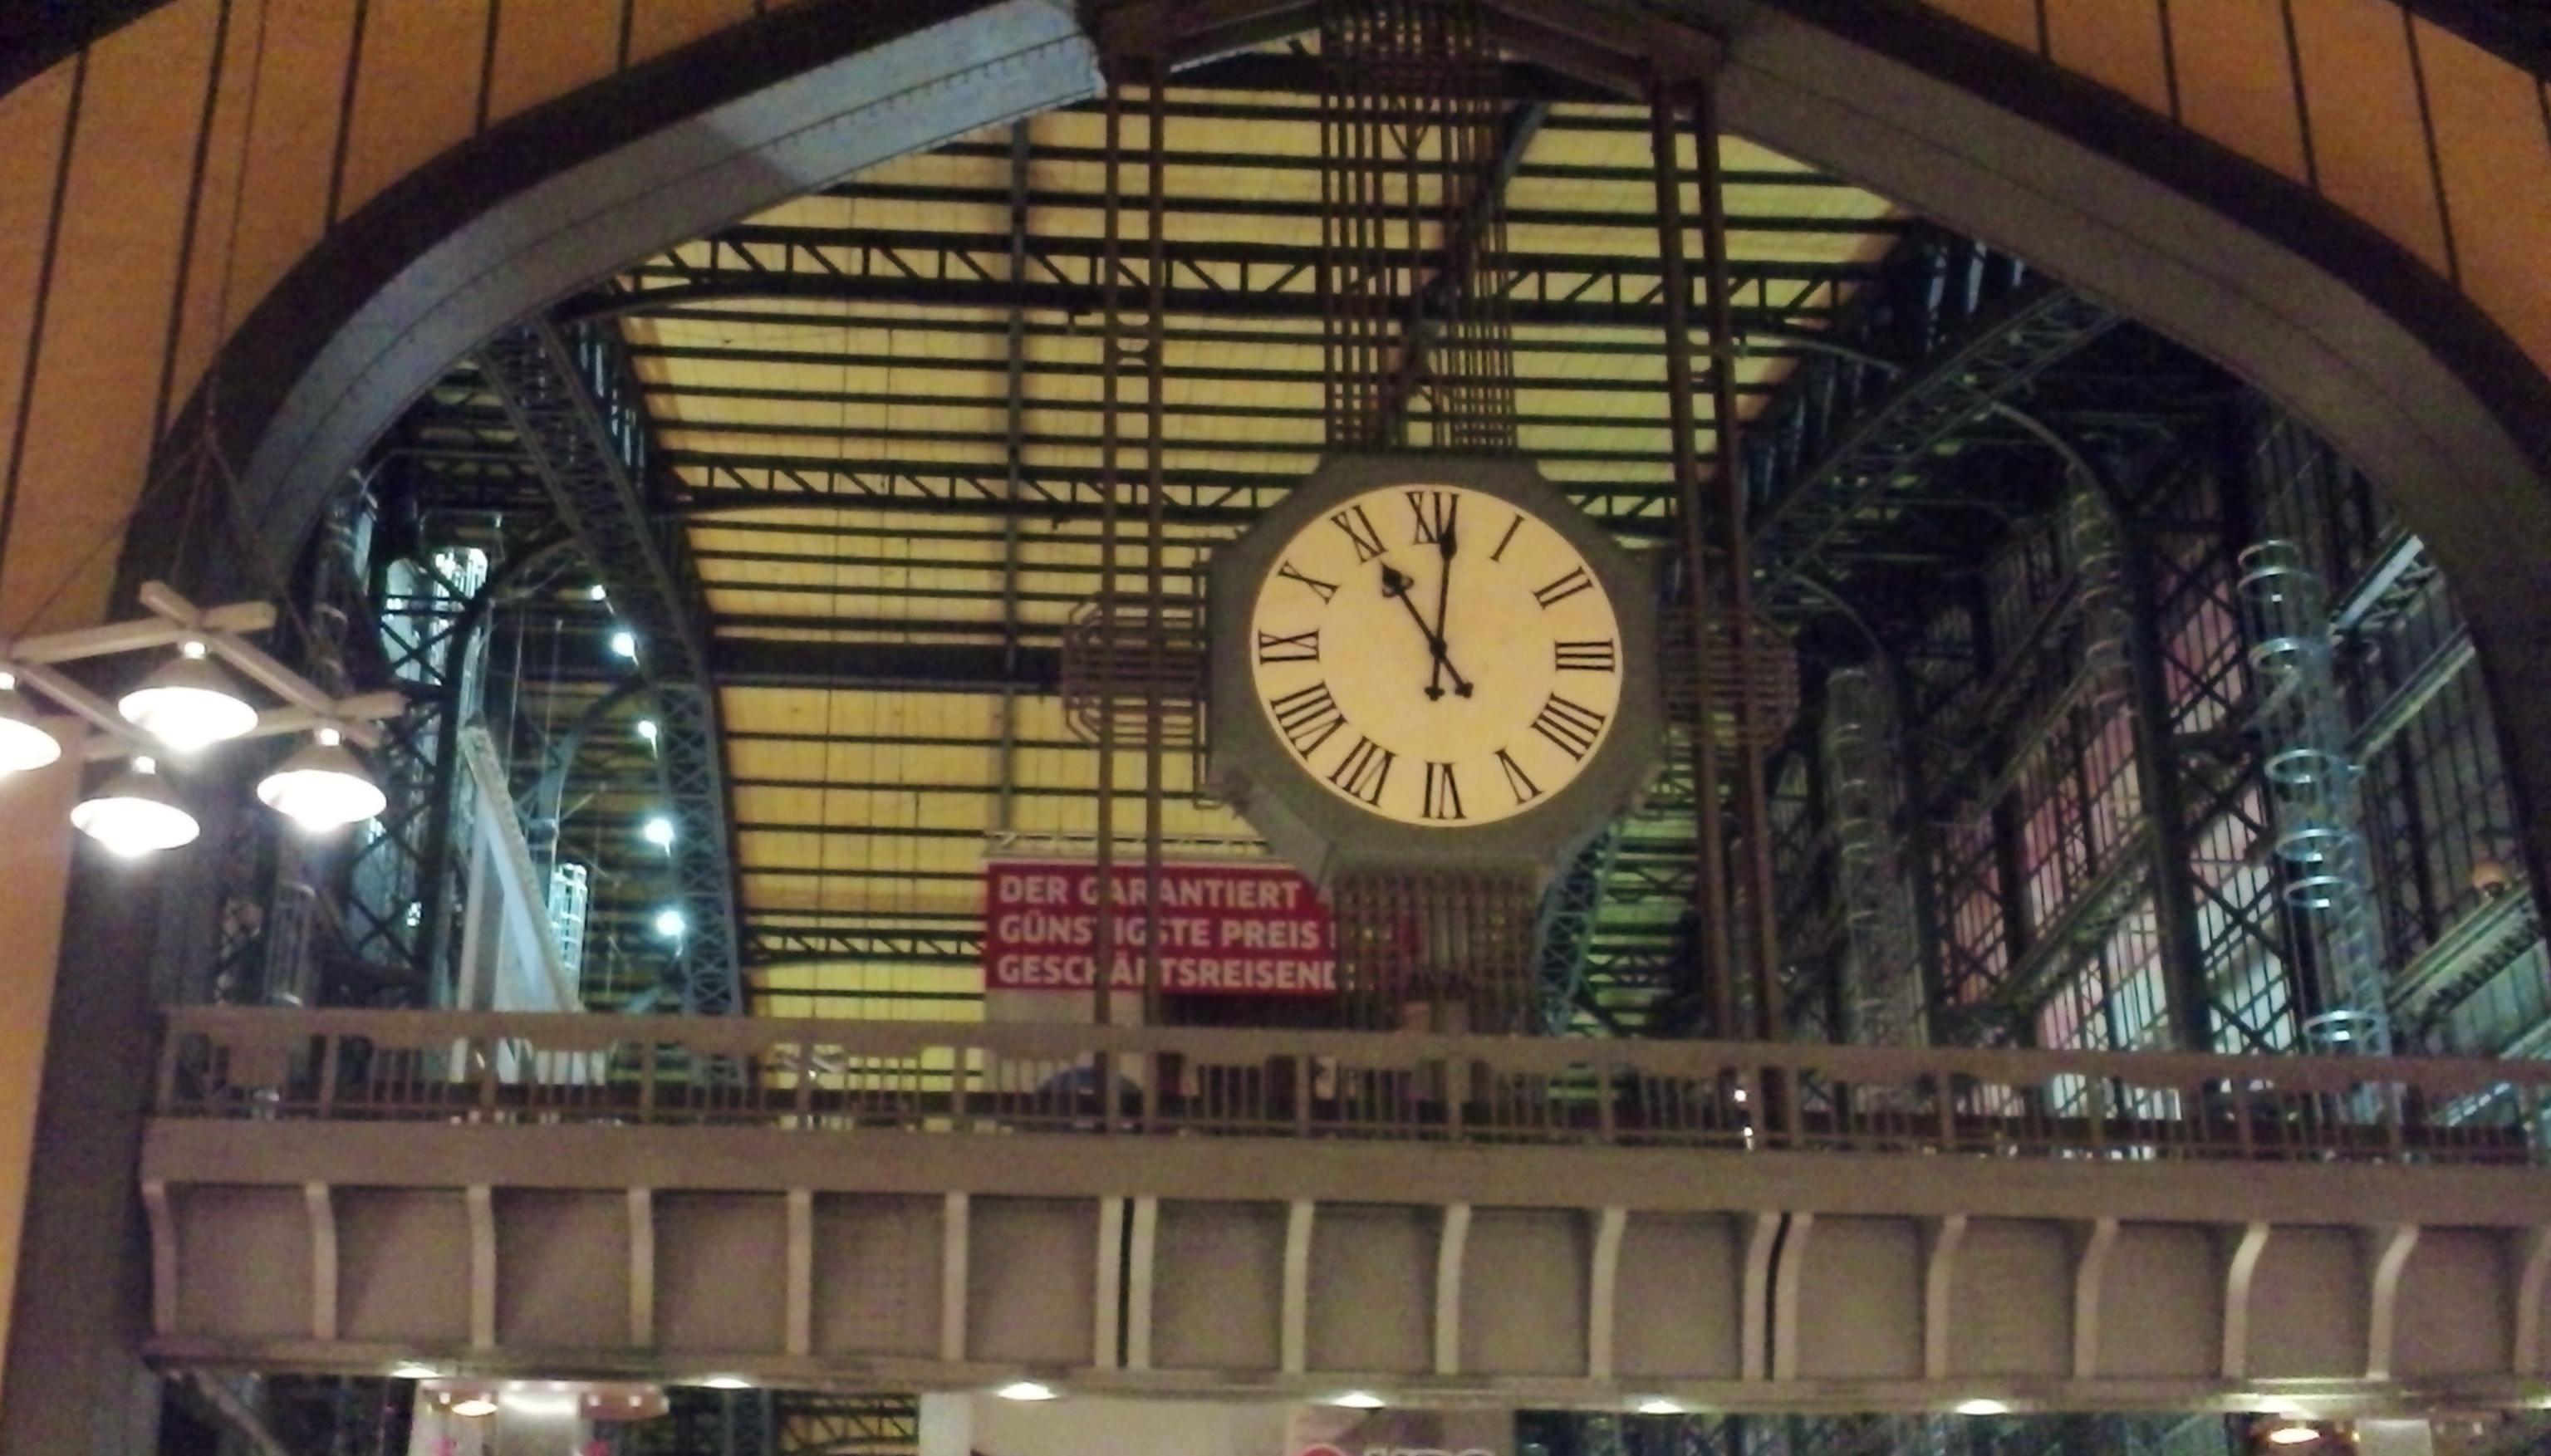 23 Uhr am Hauptbahnhof - ab ins Hotel